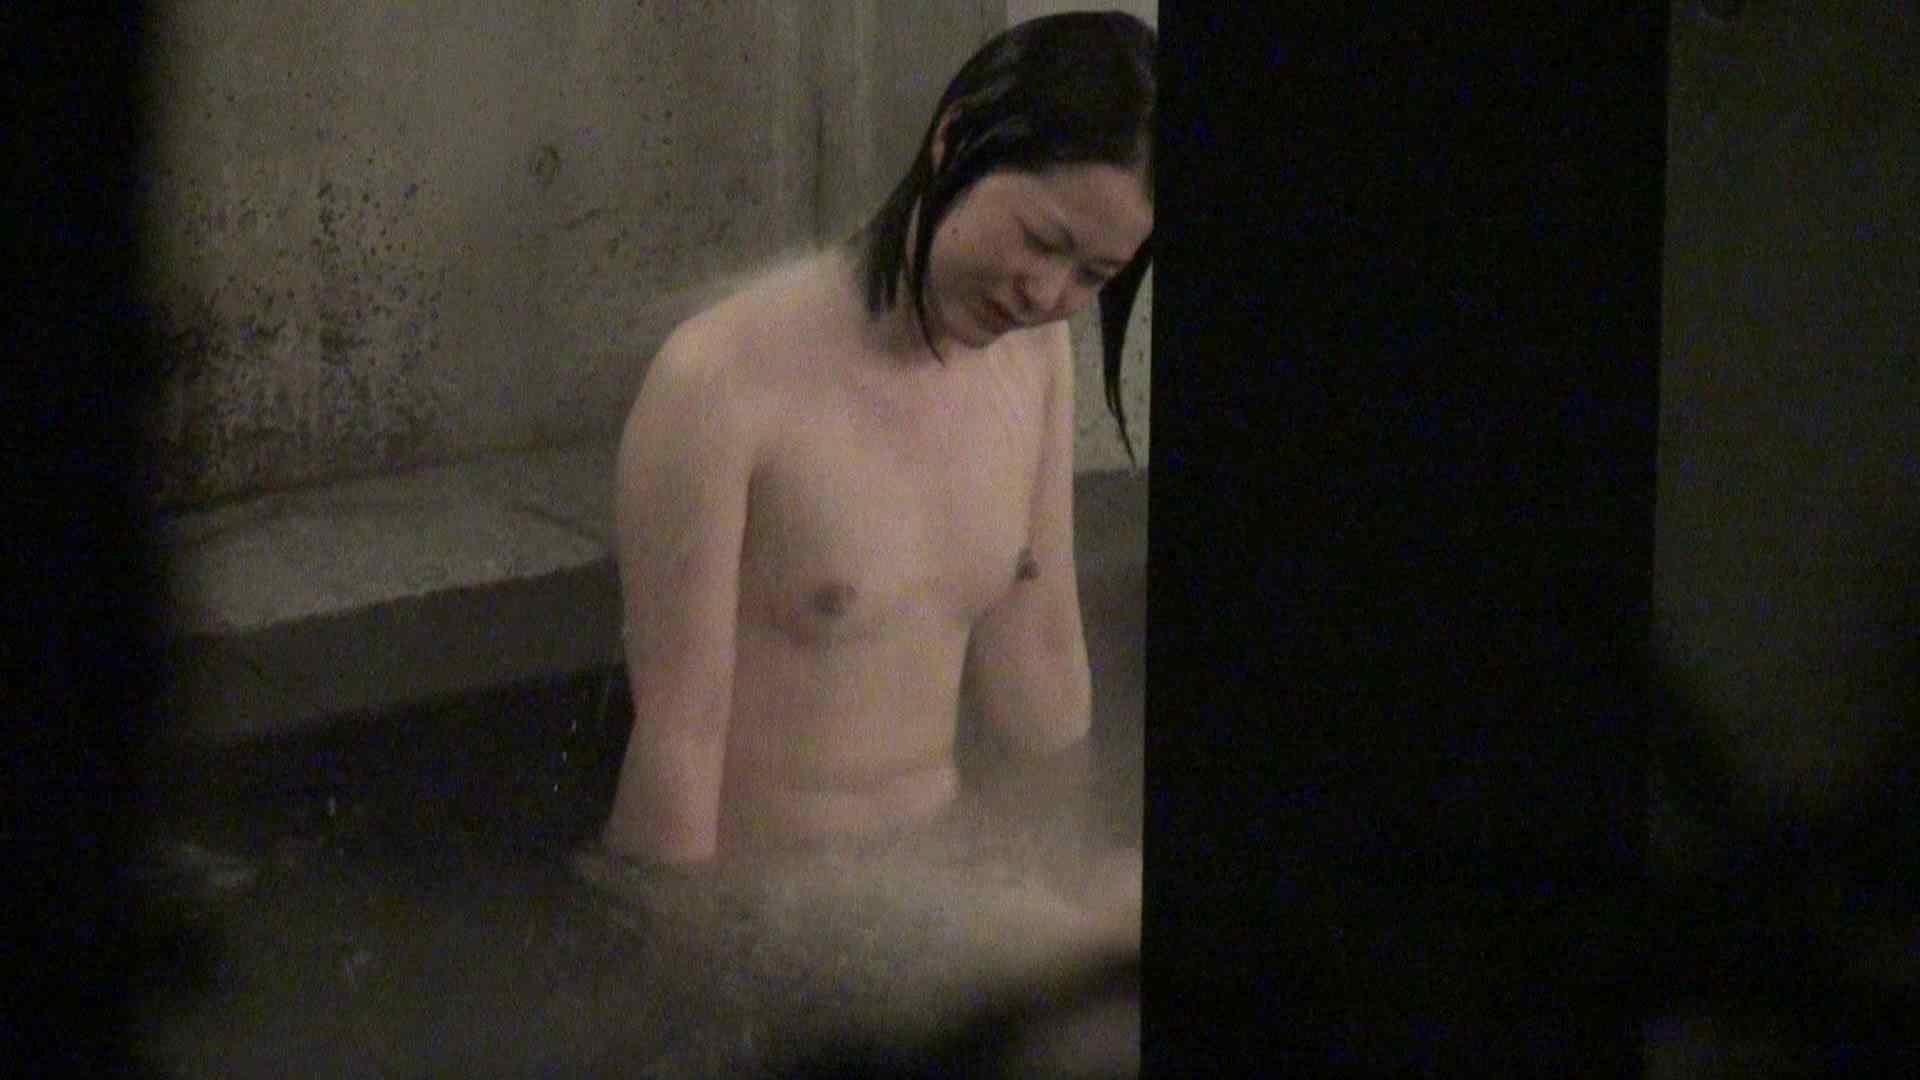 Aquaな露天風呂Vol.404 露天 おめこ無修正動画無料 112pic 7